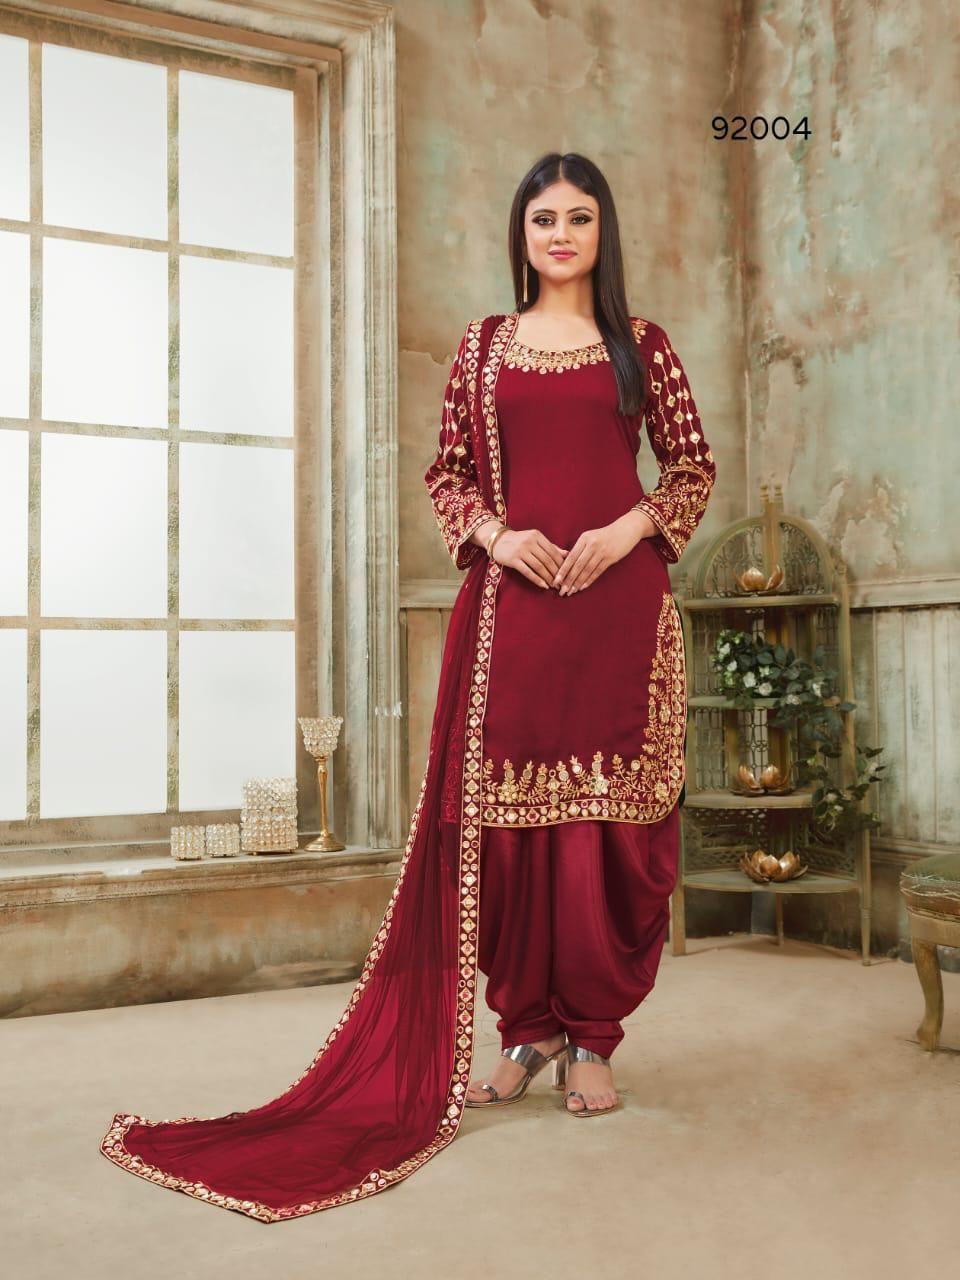 Twisha Aanaya 92004 Wine Color Art Silk Fabric Patiyala Style Punjabi Salwar Suit Wholesaler Stitching Dresses Indian Women Fashion Patiala Suit